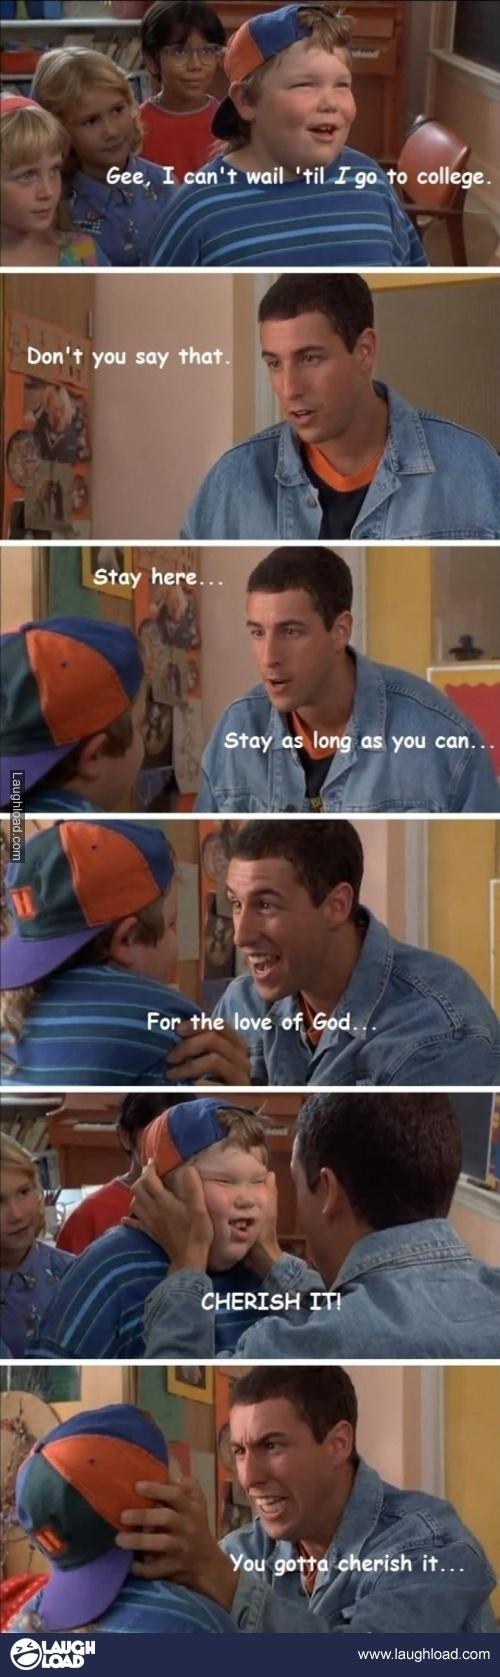 best advice ever lol